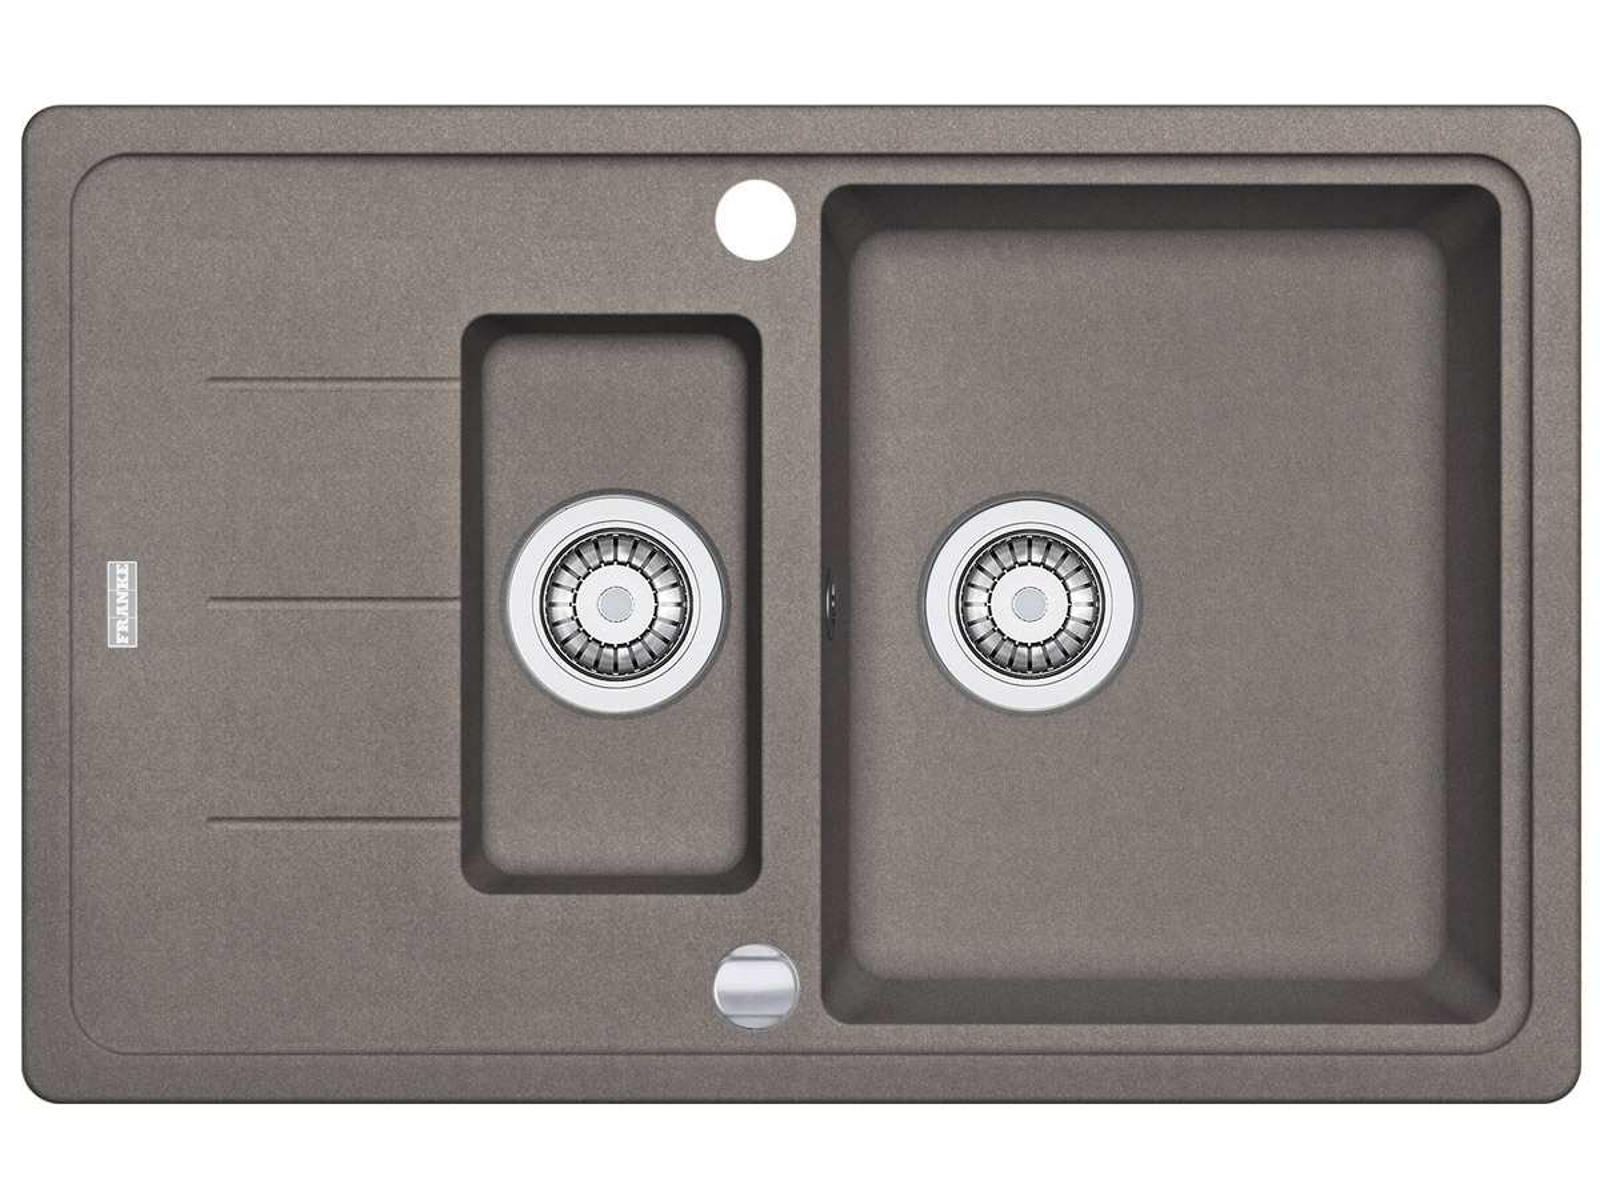 Draufsicht von Franke Basis BFG 651-78 Cashmere Granit-Spüle